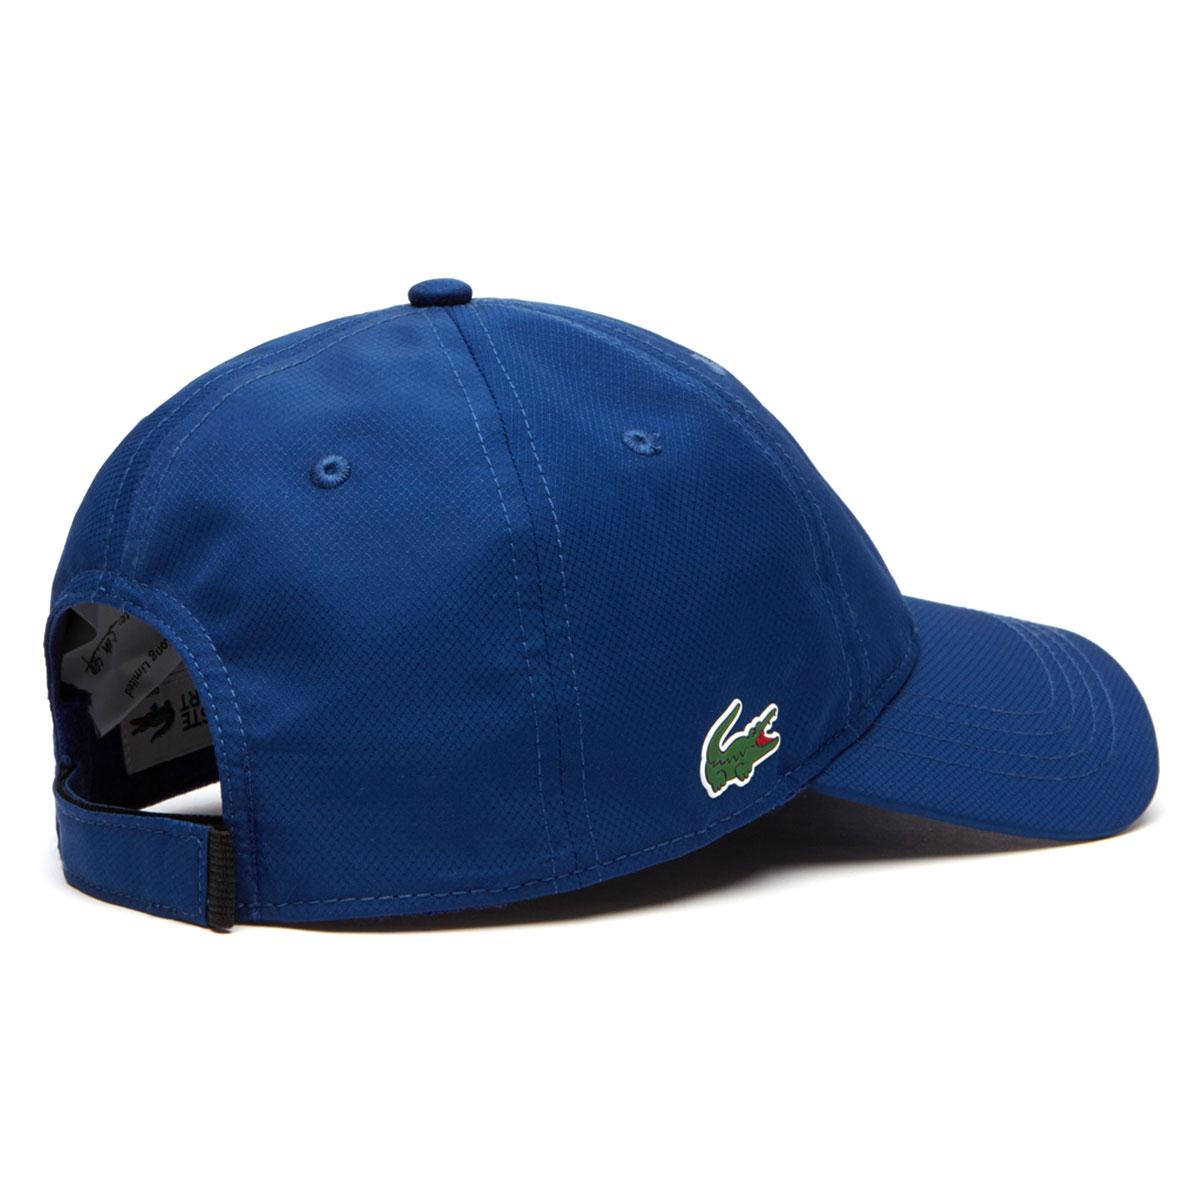 6573c903b0e Lacoste Mens 2019 RK2447 Sports Weave Taffeta Solid Diamond Baseball ...